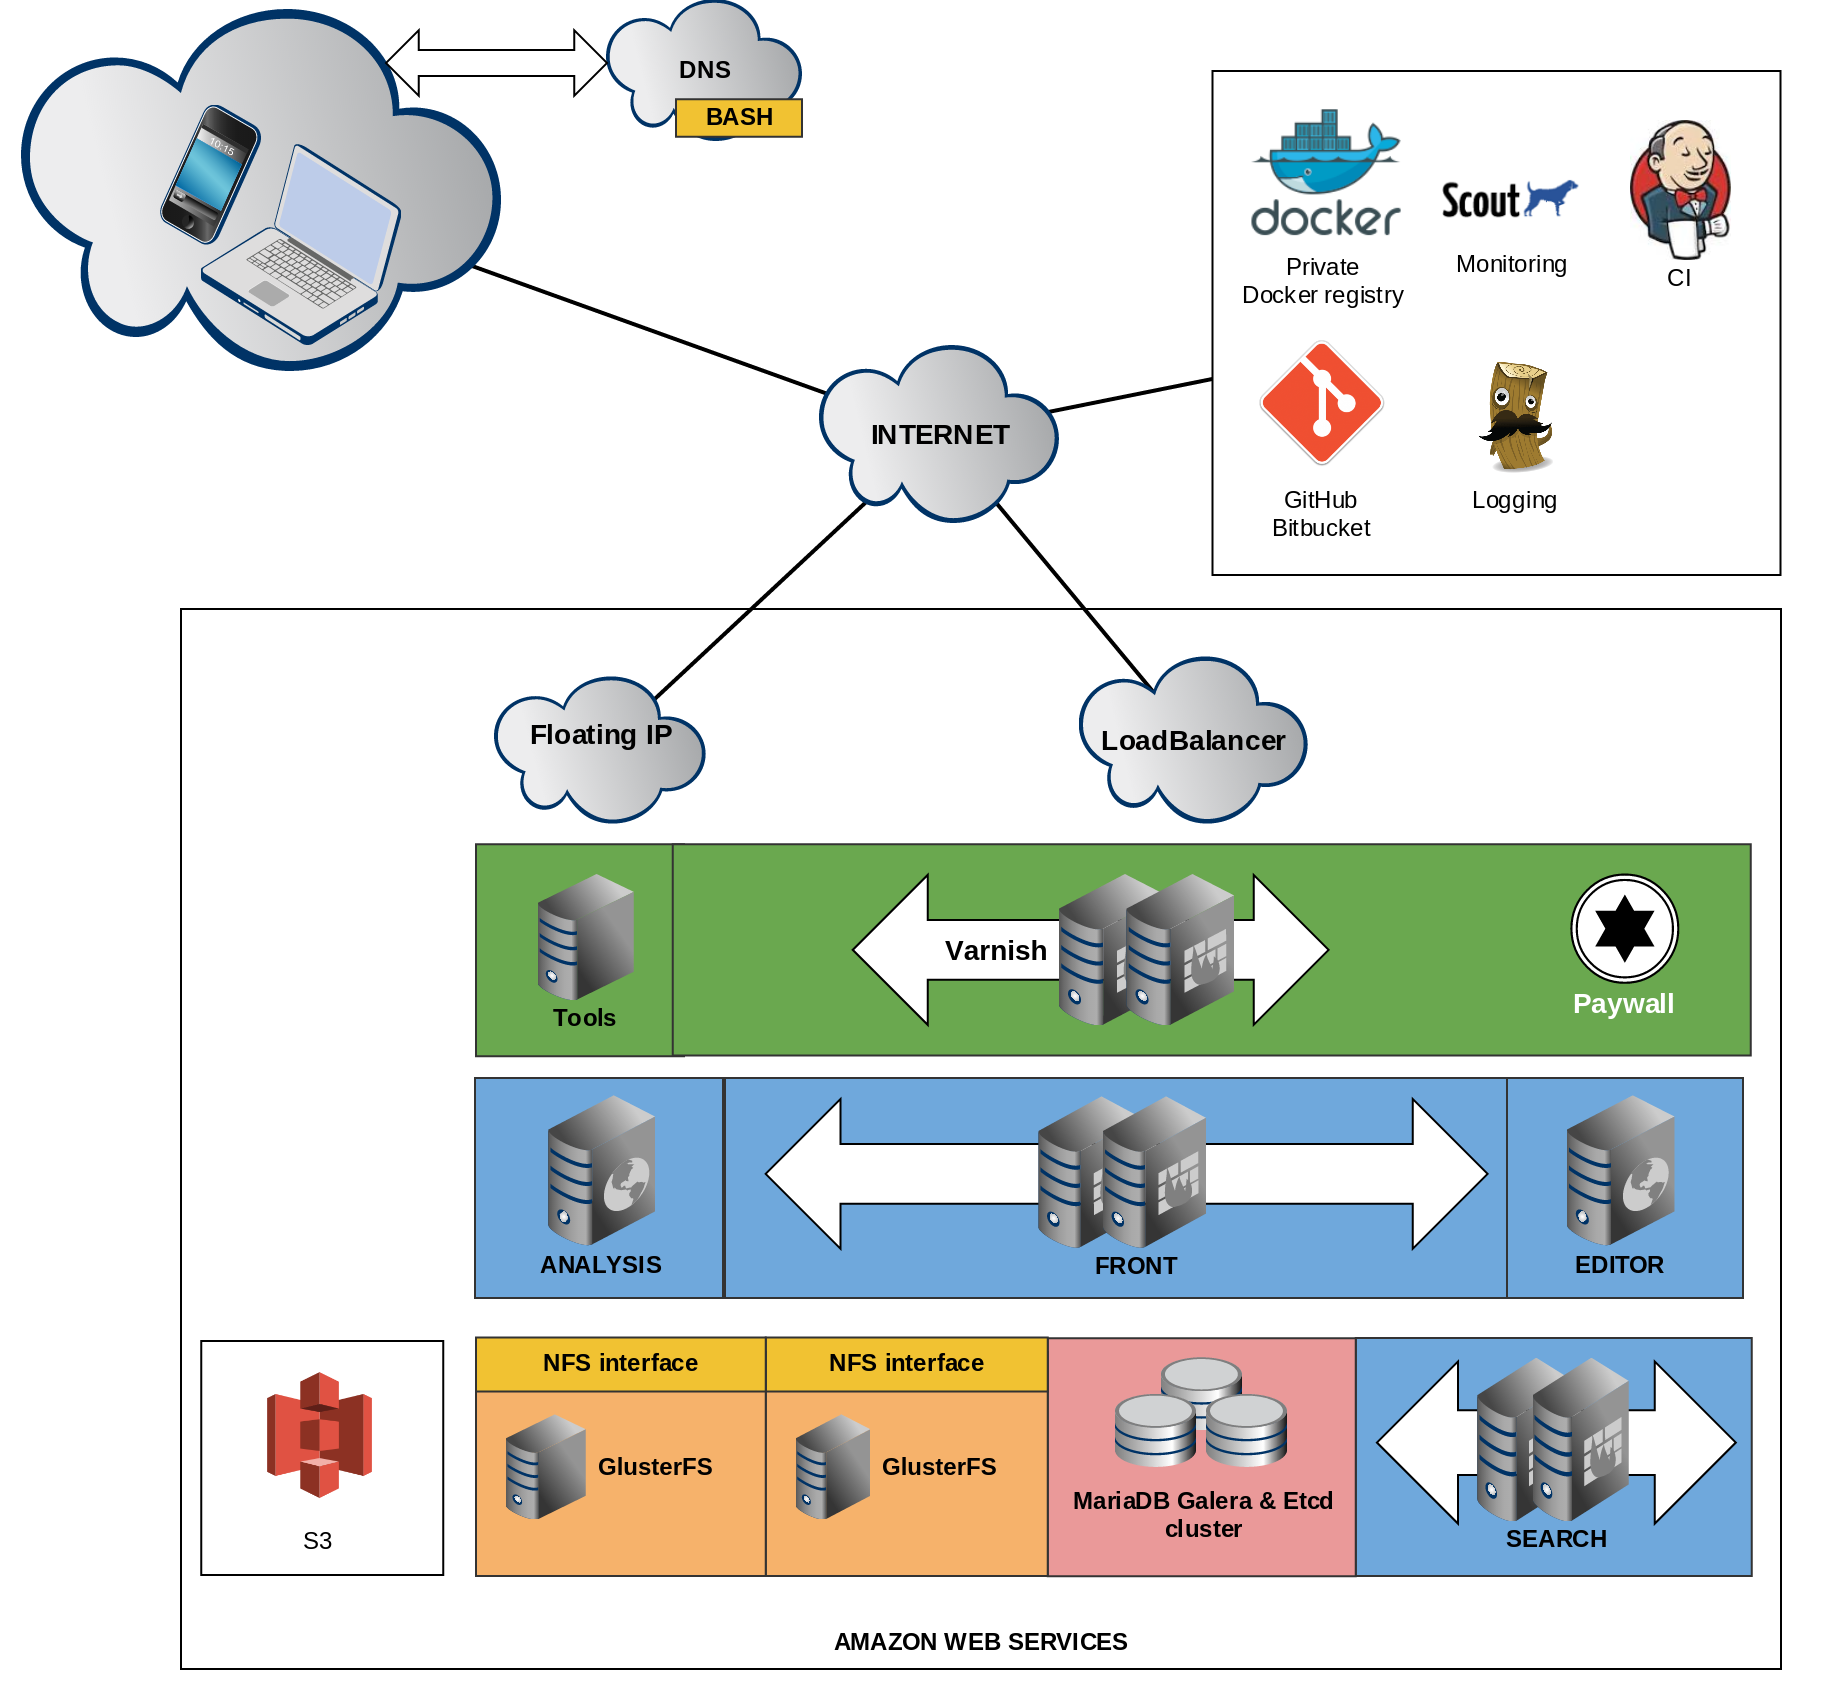 NWT Architecture 2015 v1.0a